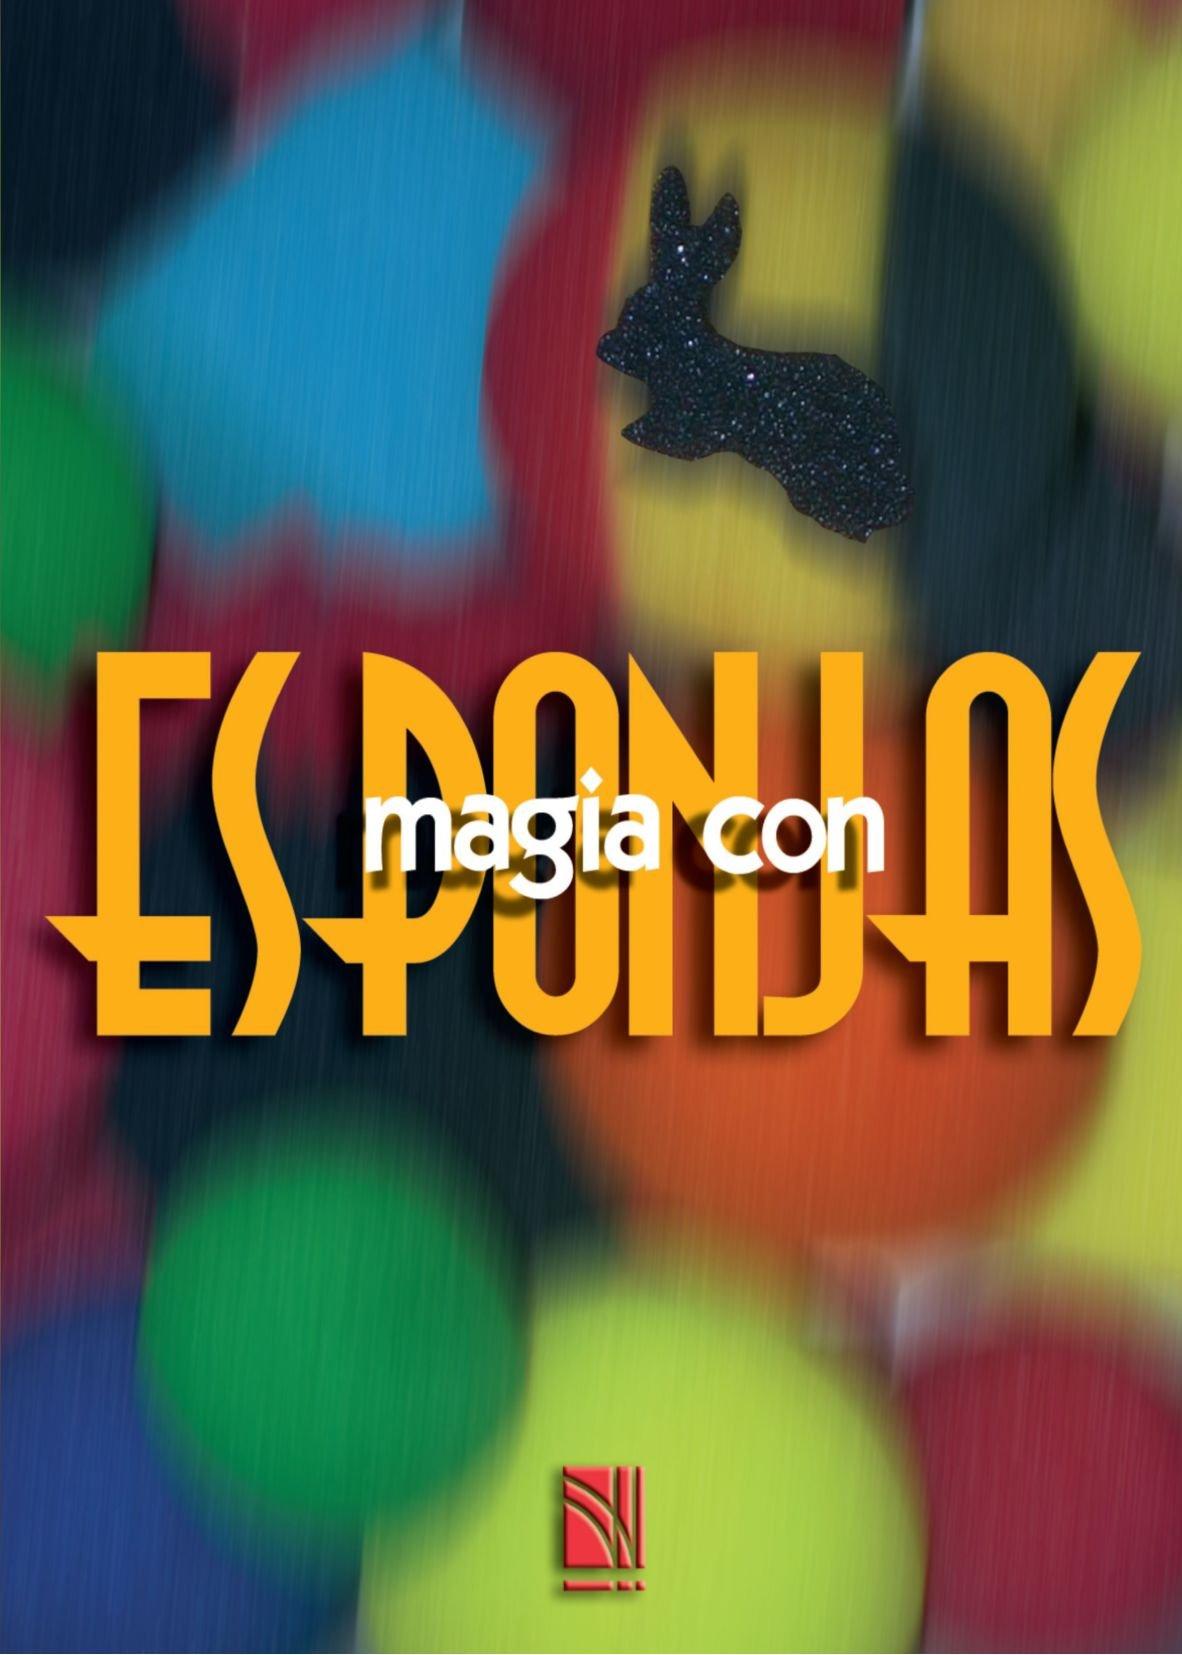 Magia con esponjas (Spanish Edition)